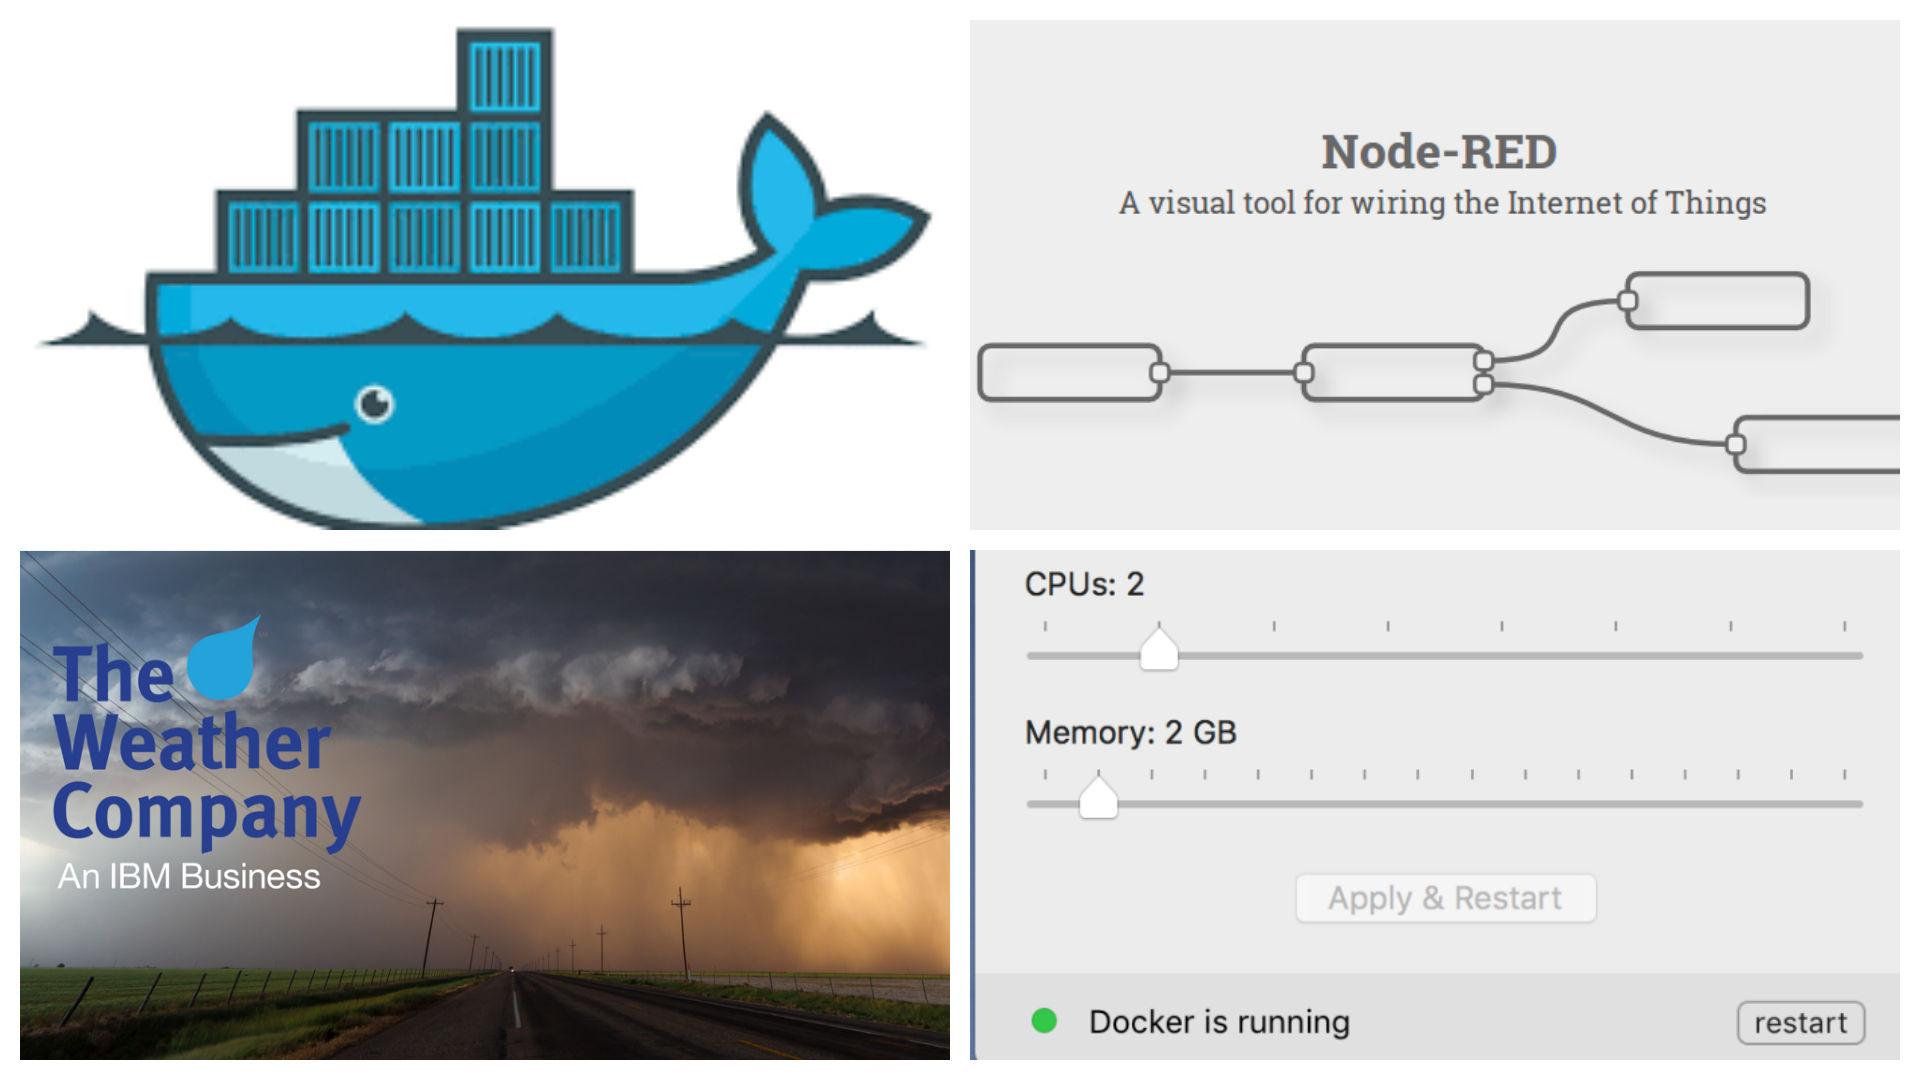 Node-RED flows for Docker